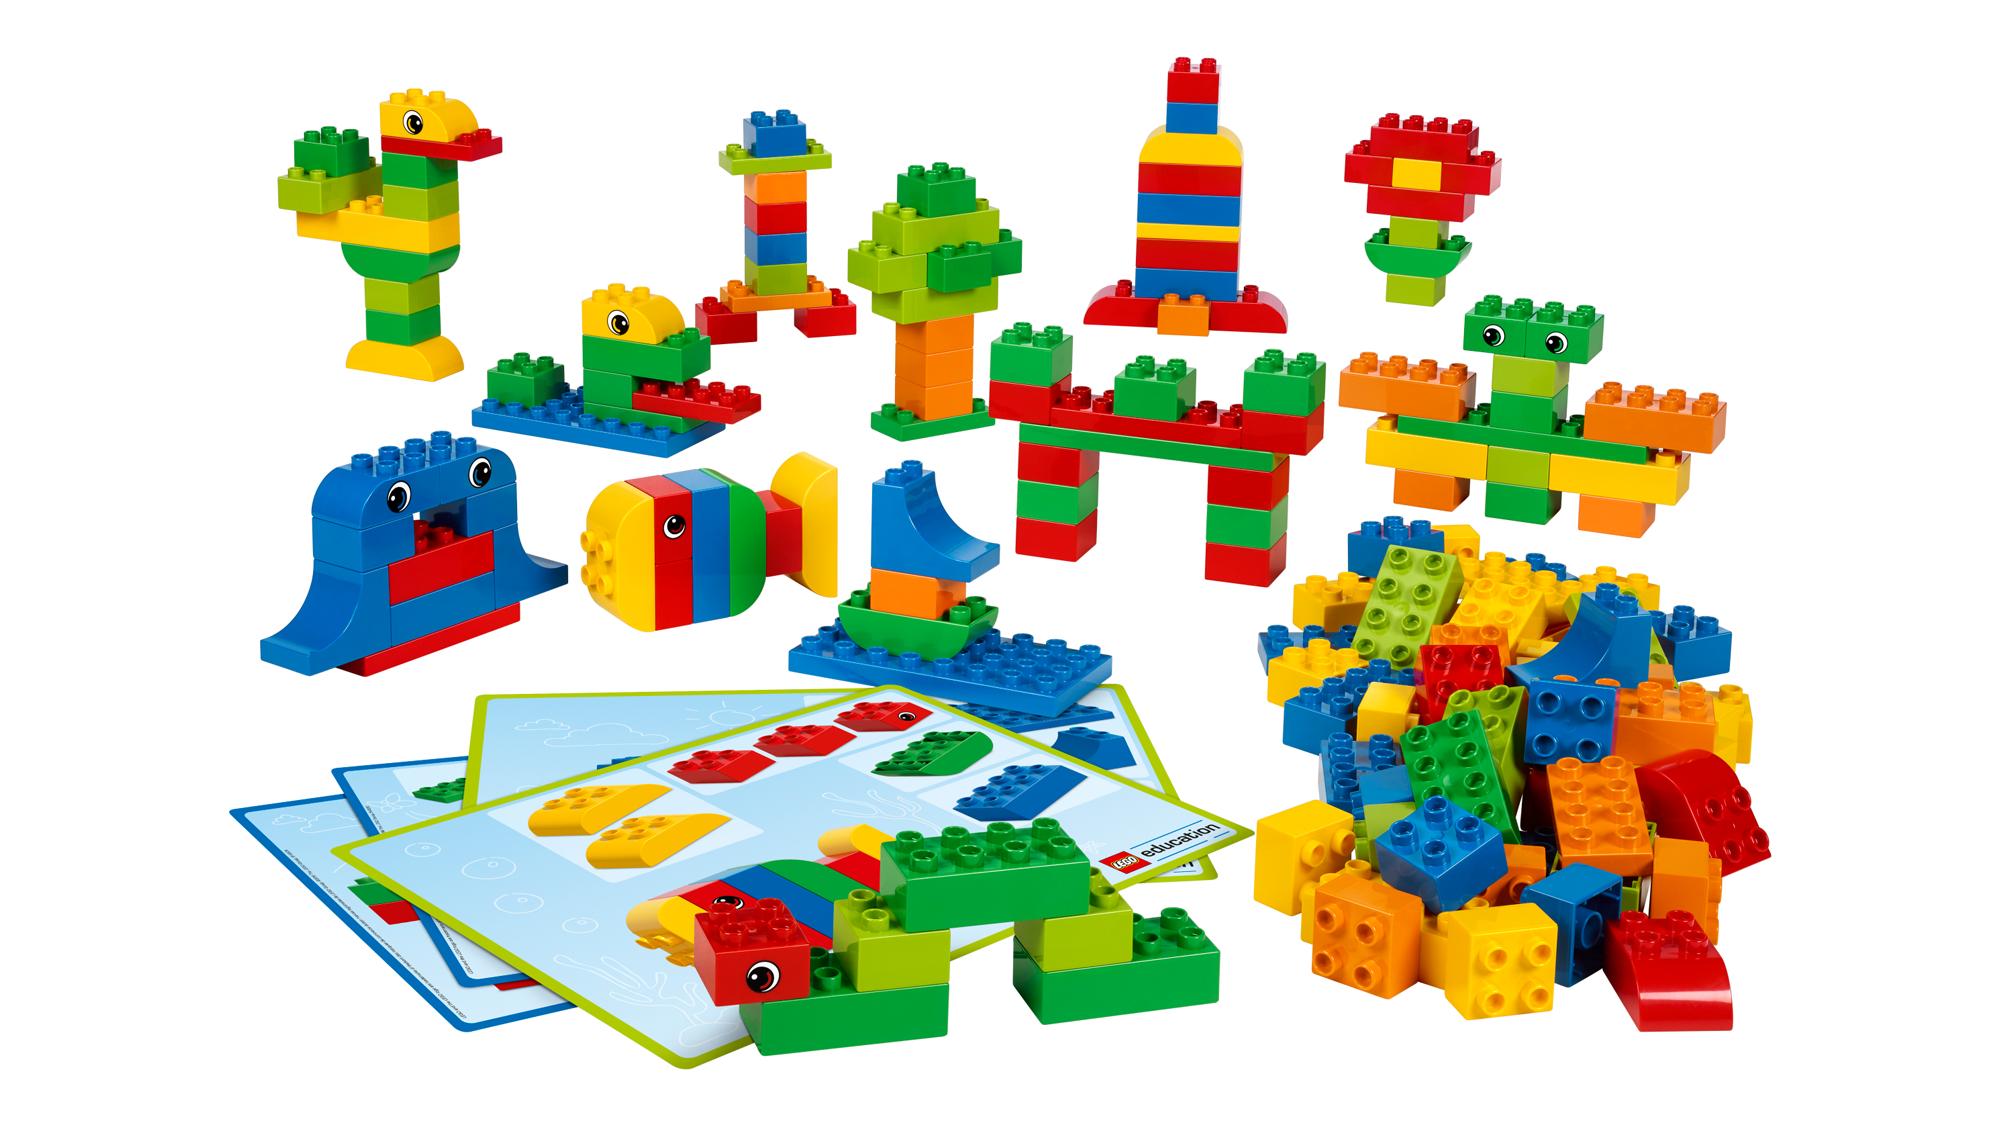 Creative LEGO® DUPLO Brick Set by LEGO Education